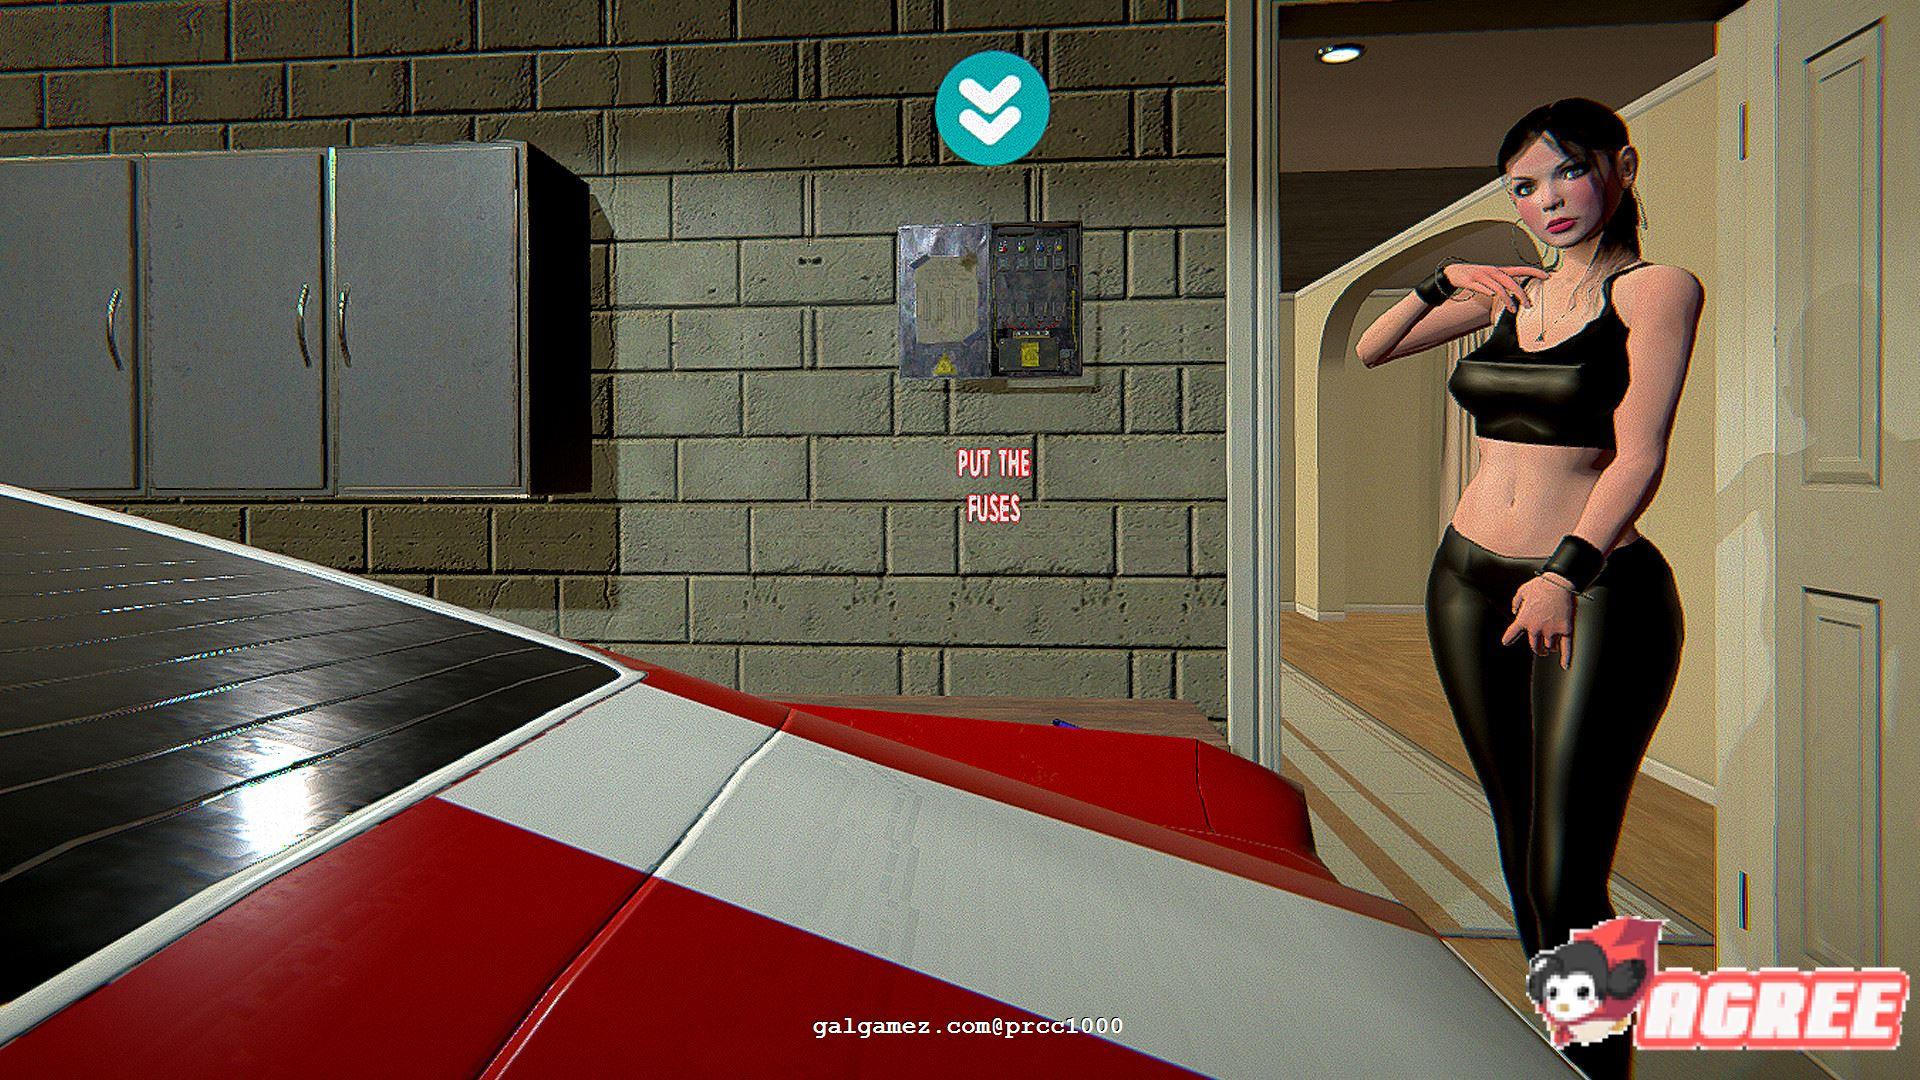 [3D互动/全动态] [超强互动] 老姐,我想修你车 STEAM完整正式版 [百度][3.5G]